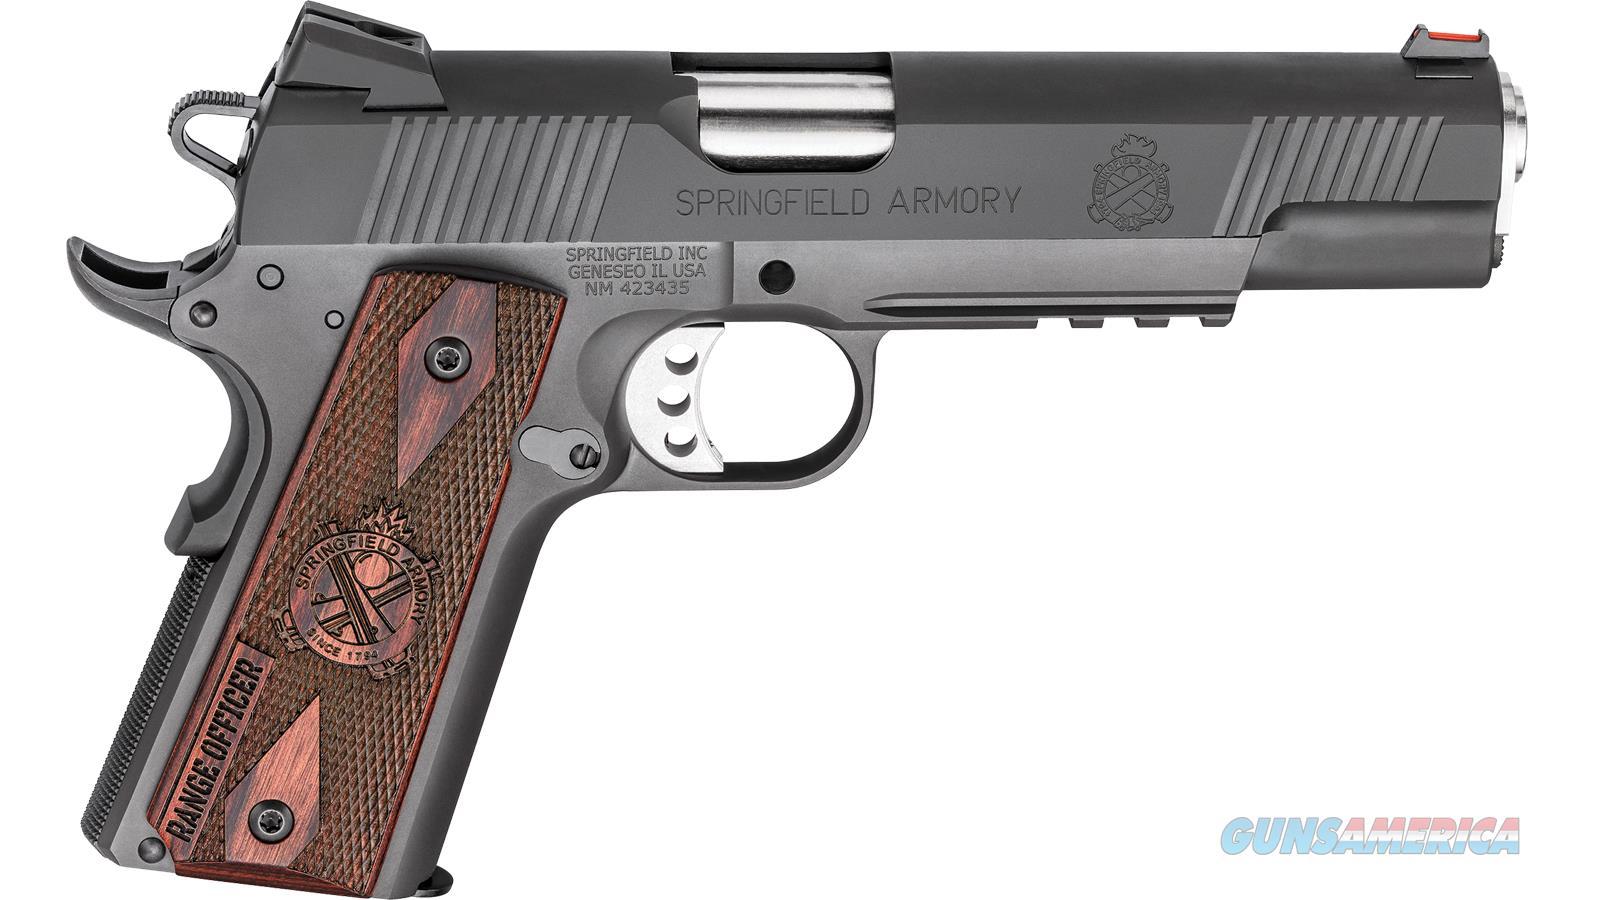 Springfield Armory 1911 45Acp 5 Range Officer Parkerized PI9131L  Guns > Pistols > S Misc Pistols